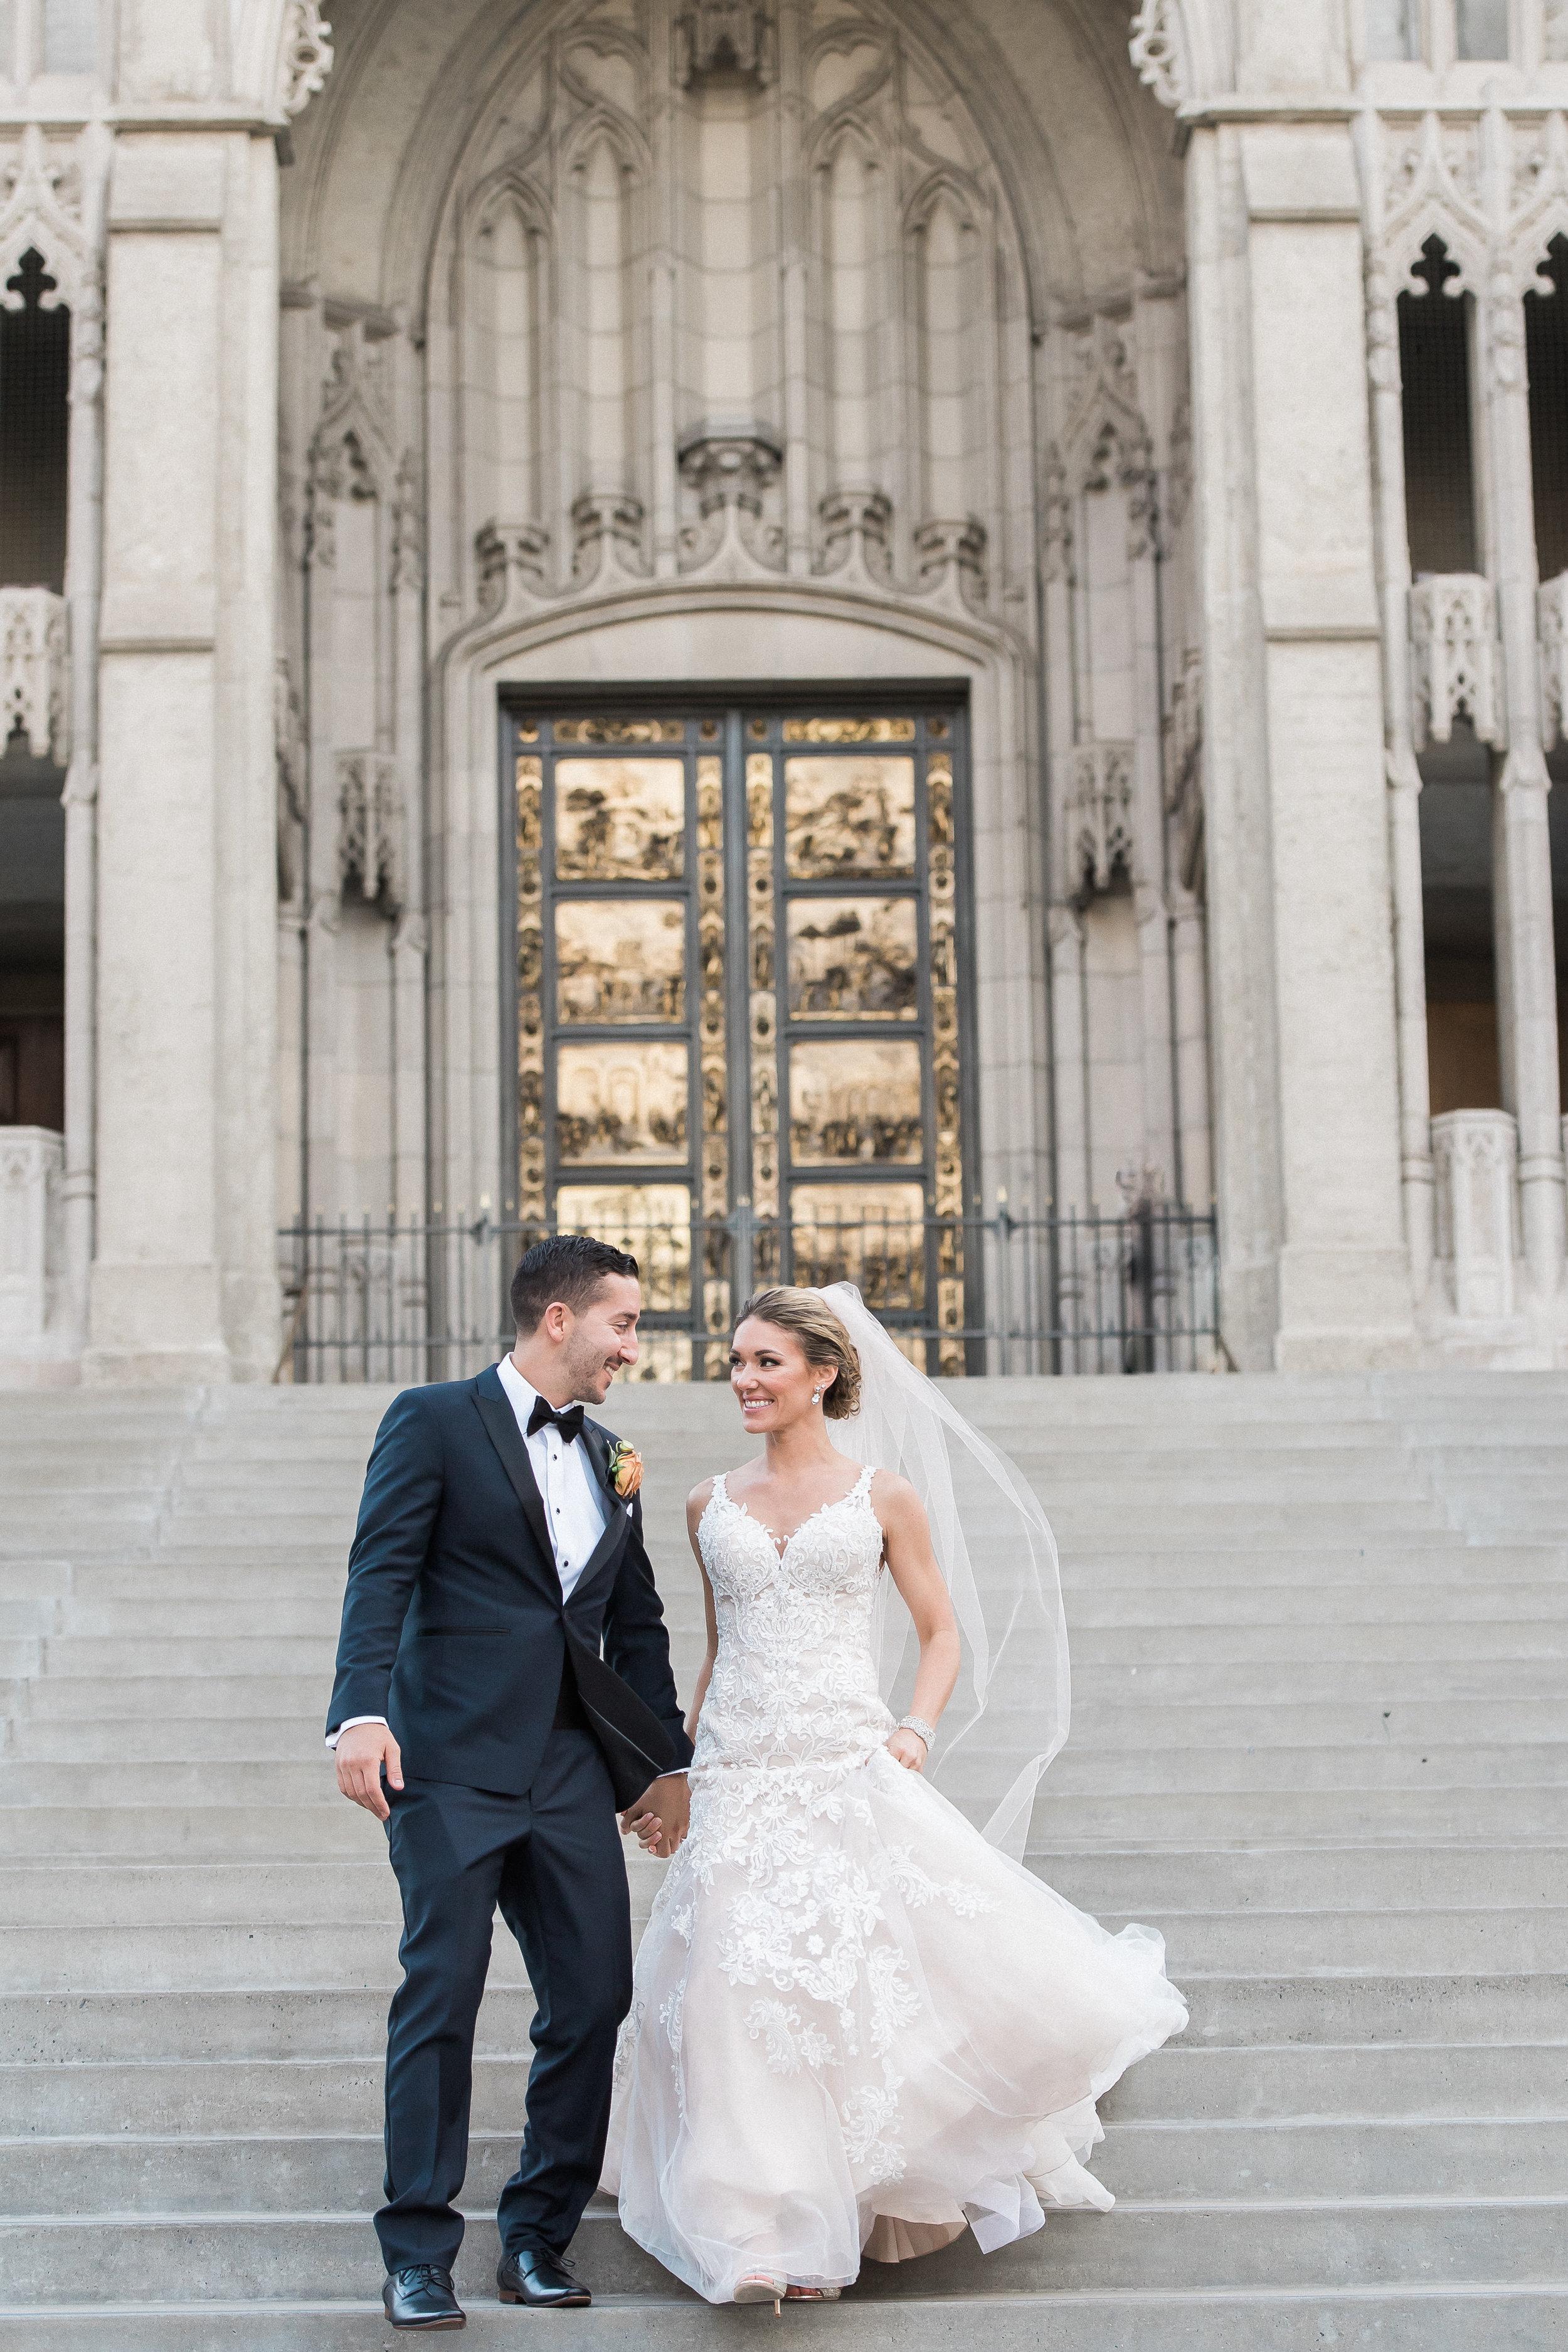 Katie+Nick_wedding_spp-blog-78.jpg